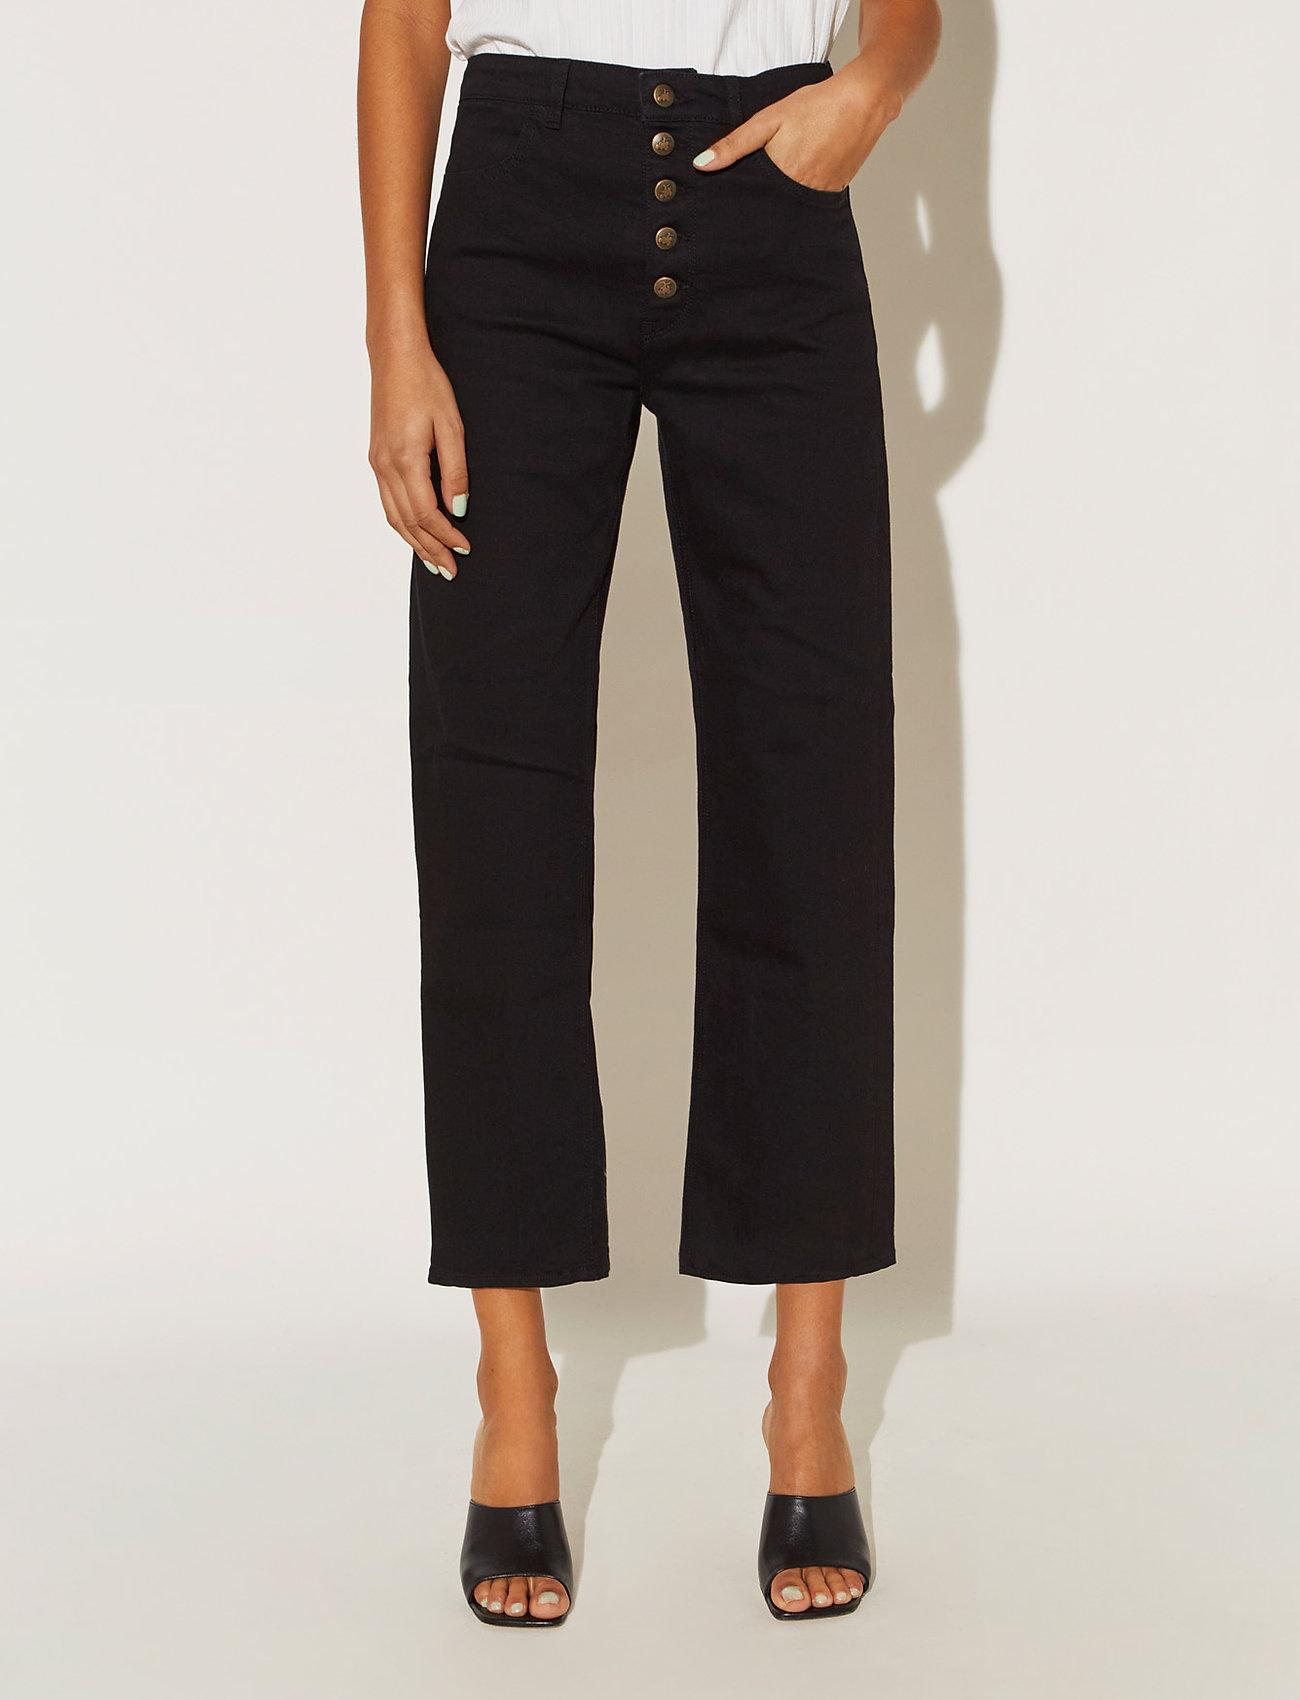 By Malina - Edith jeans - straight regular - black - 0